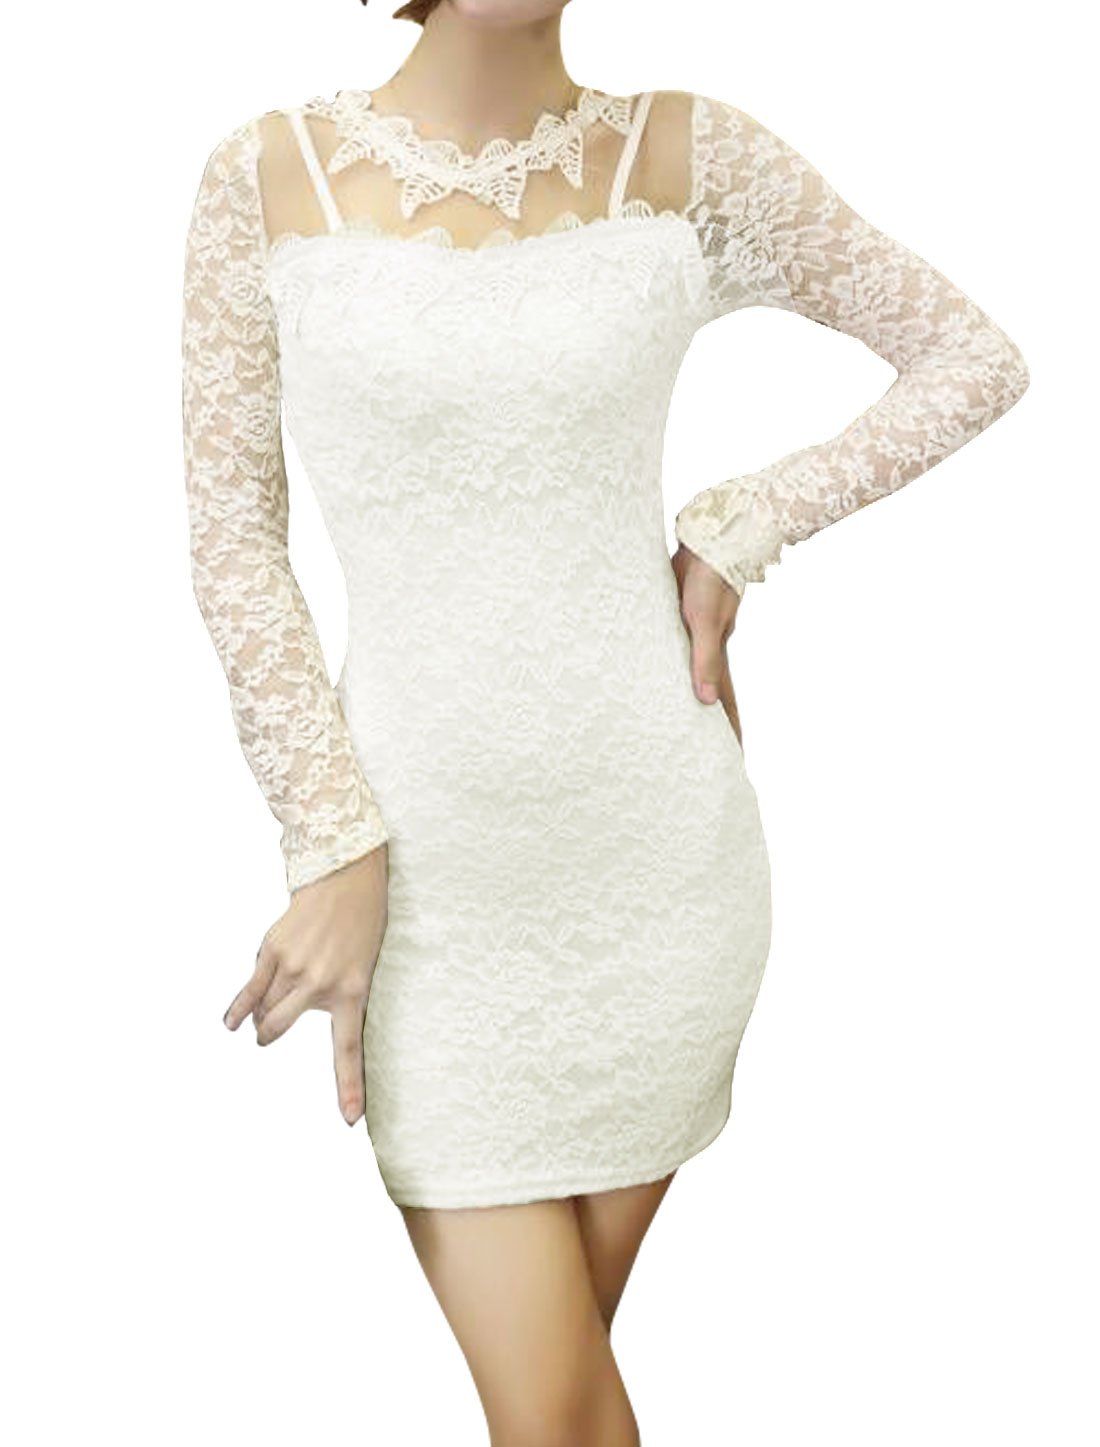 Women Leaves Applique Mesh Panel Lace Mini Bodycon Dress White XS